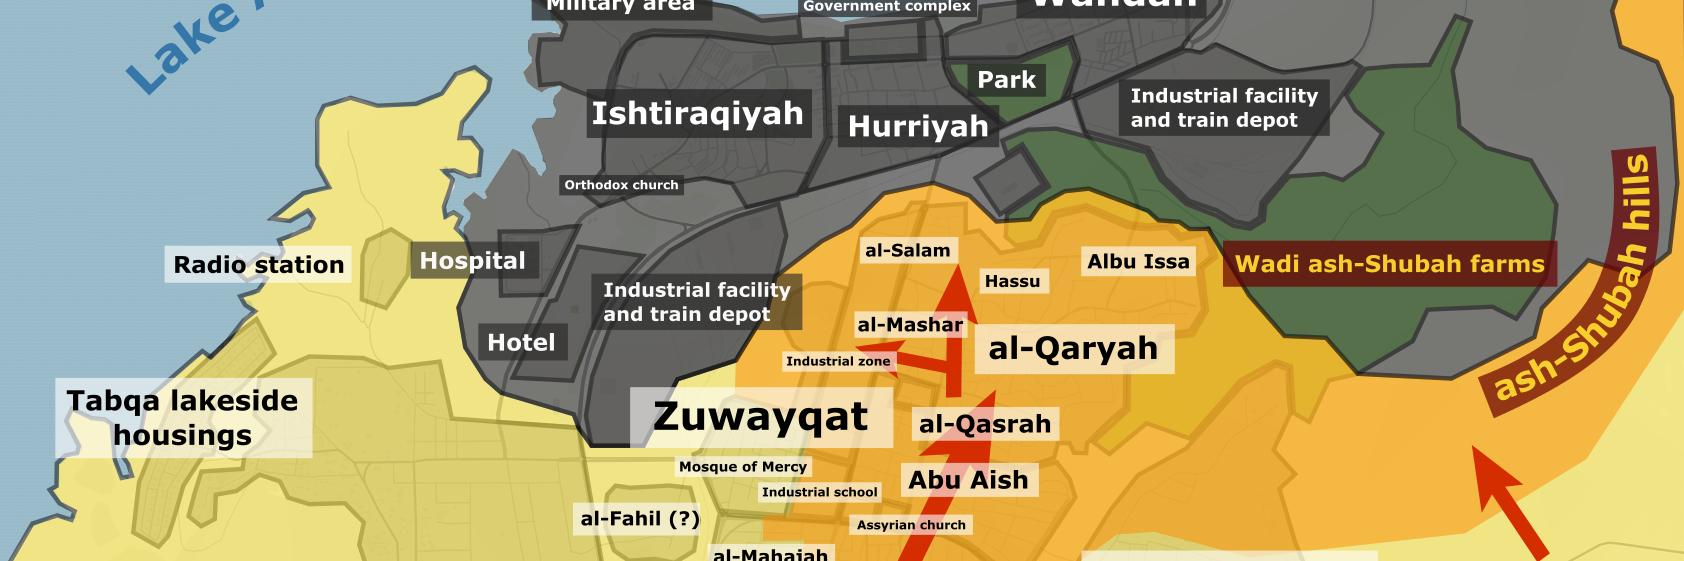 Map of the Front of Ma'arrat an-Nu'man (#MaaratAlNuman) in southeastern #Idlib, #Syria between #SAA/#Assad and #HTS… https://t.co/cIftxzEbKa